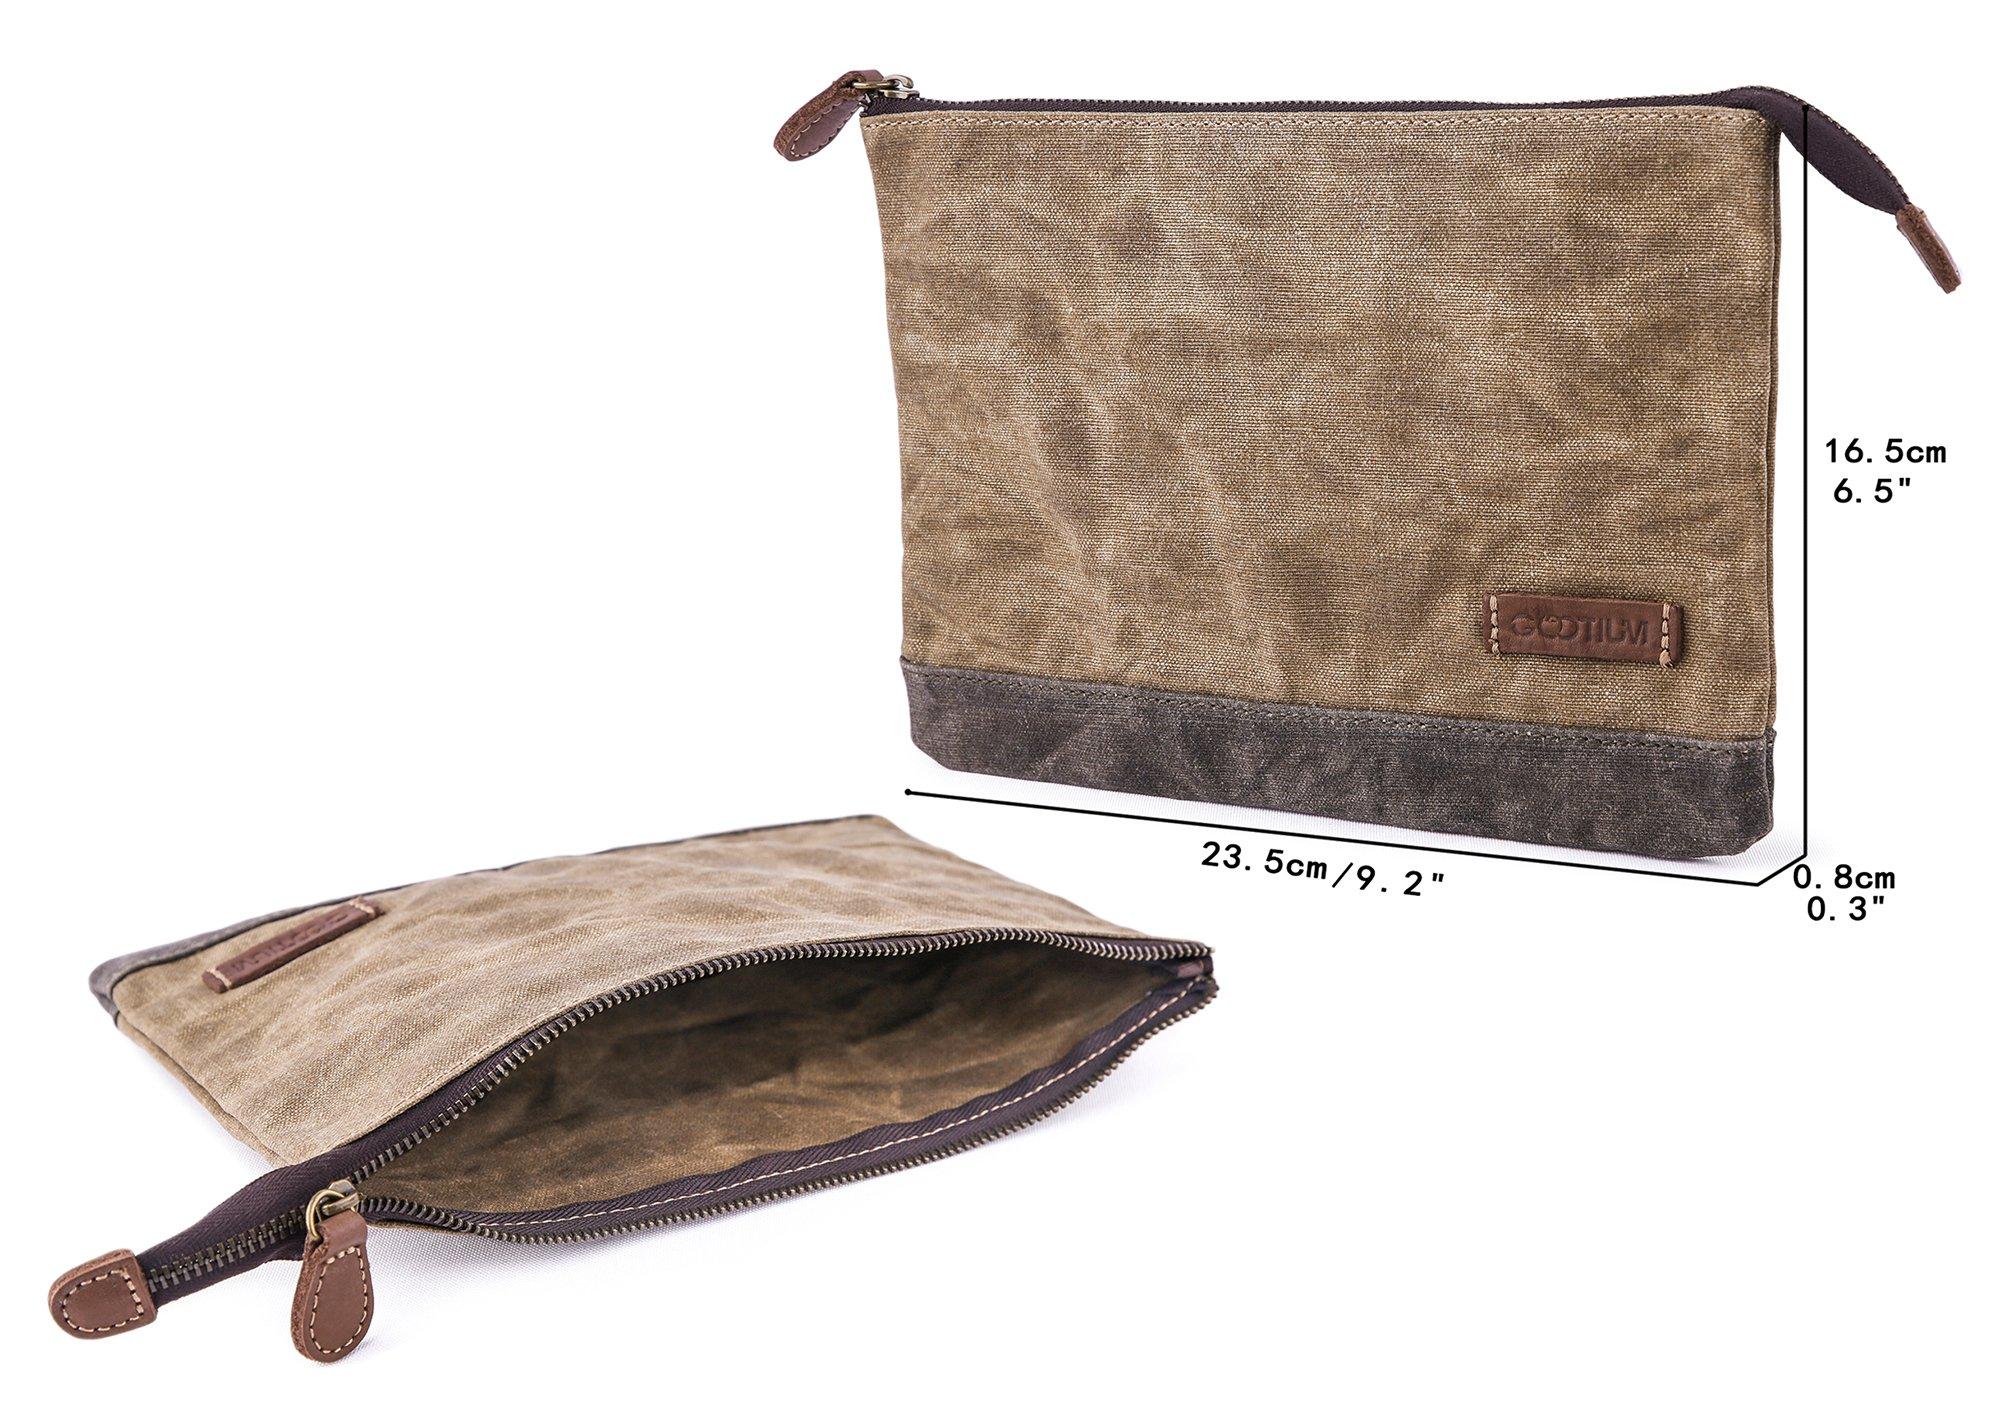 Gootium Waxed Canvas Zipper Pouch - Water Resistant Storage Holder Accessories Organizer (Pack of 2) by Gootium (Image #2)